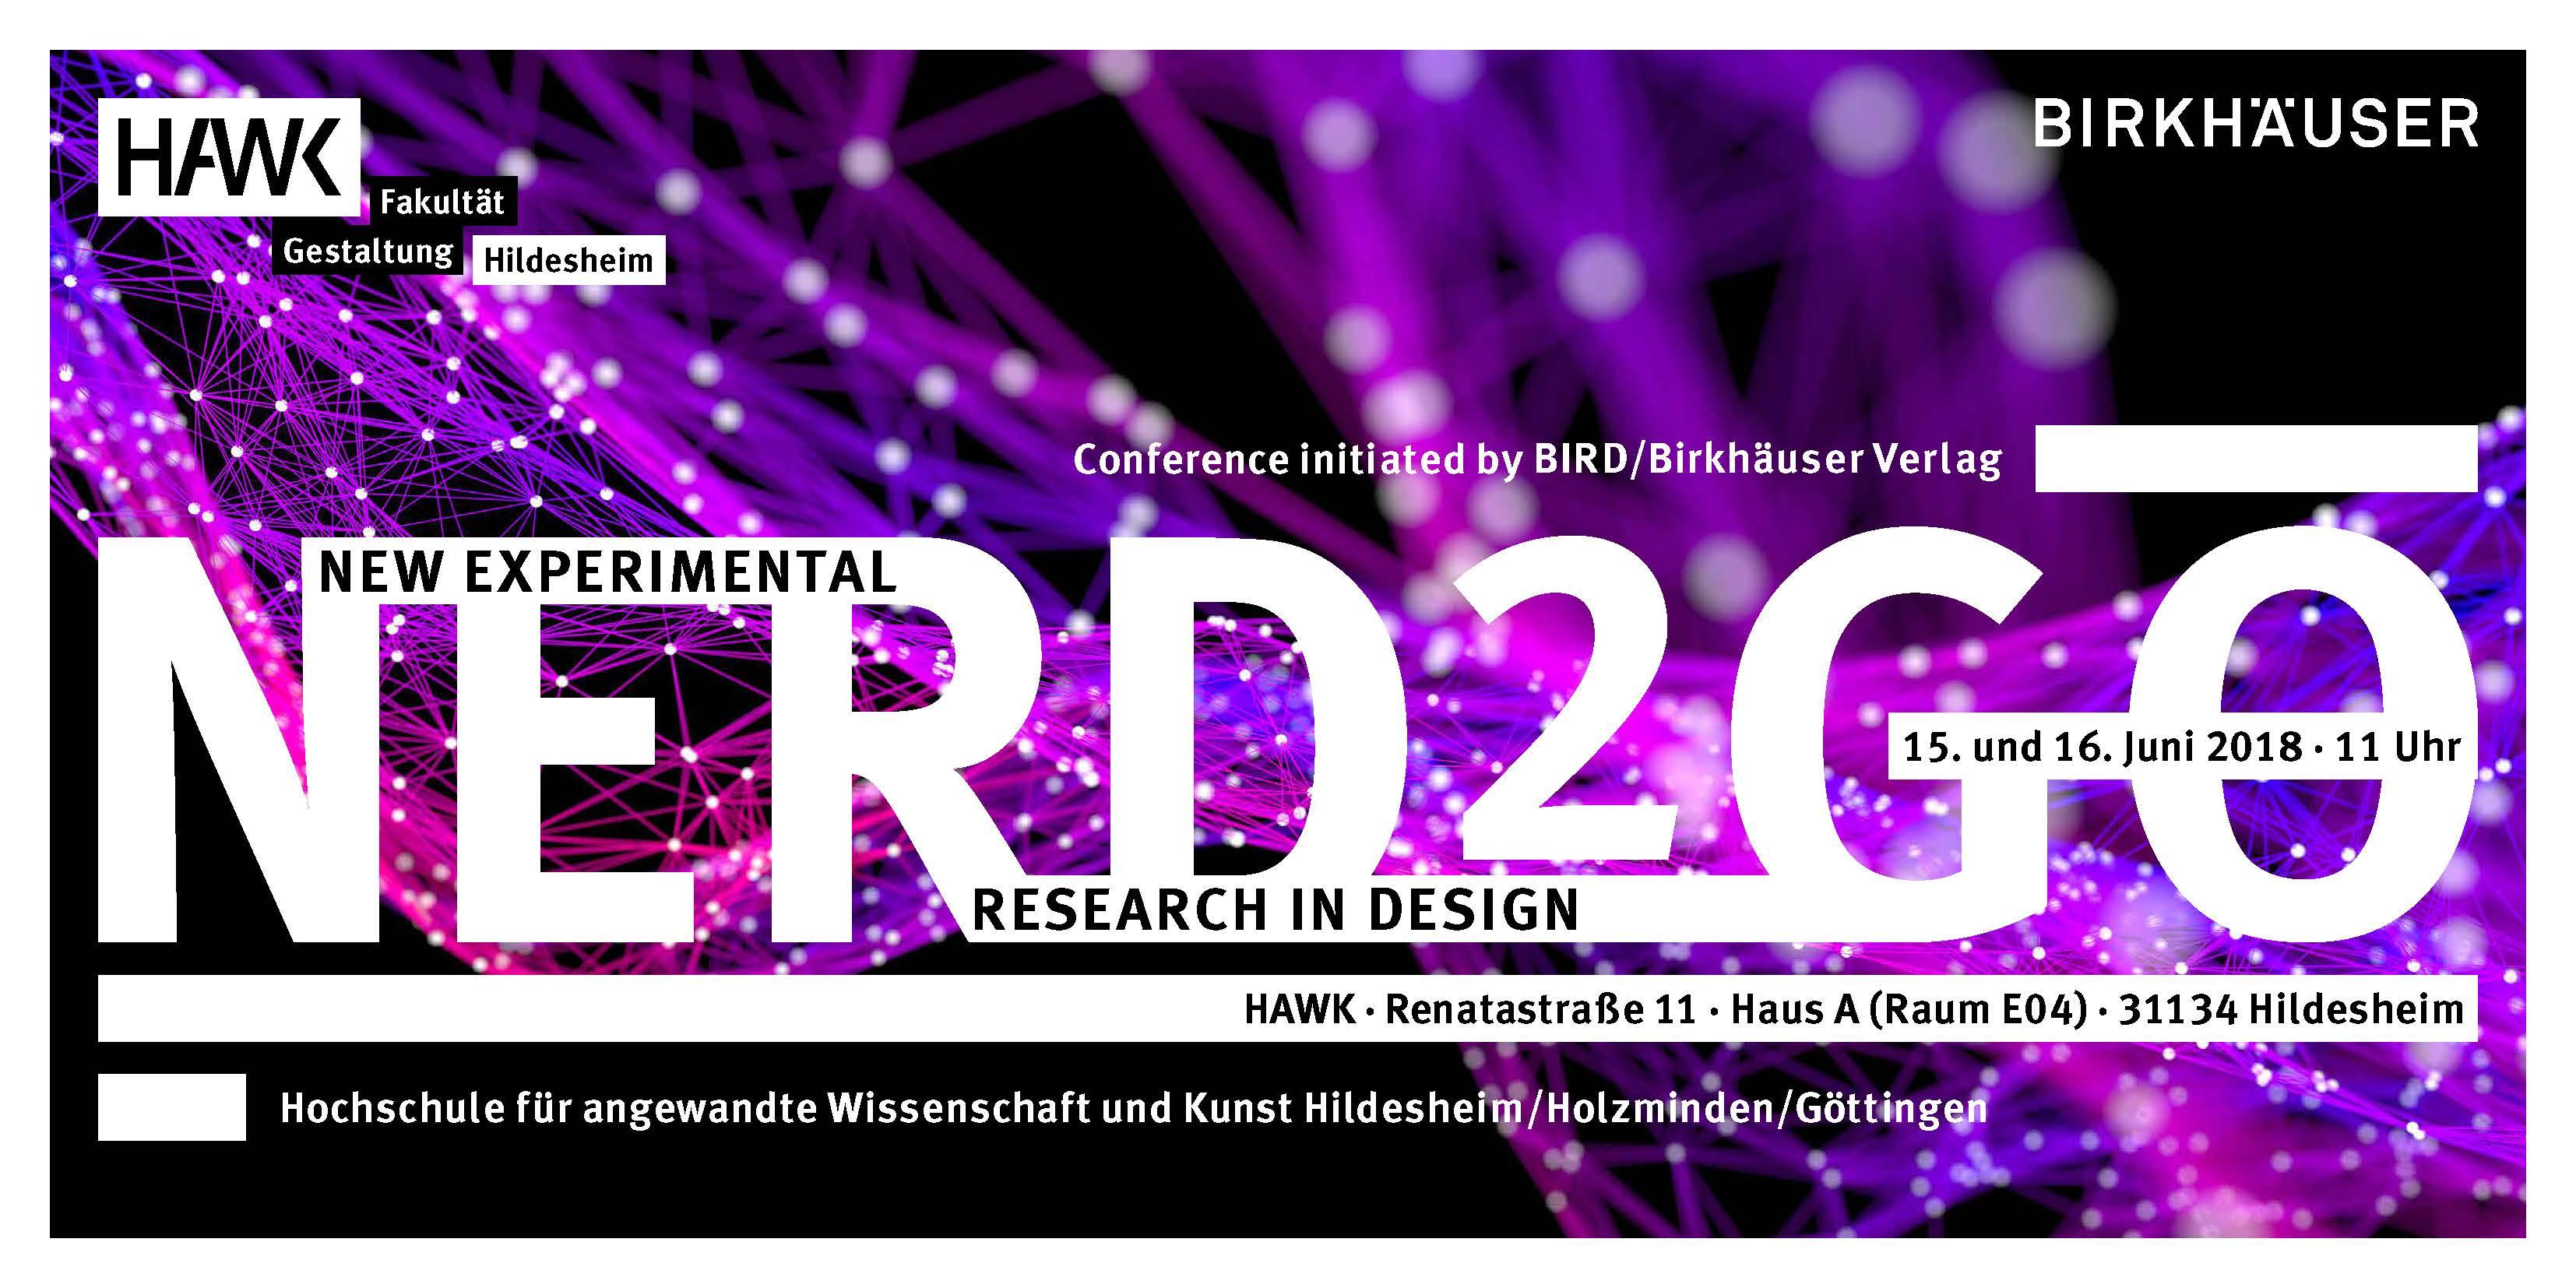 NERD2GO Conference, 15 & 16 June 2018, HAWK Hildesheim, Germany ...